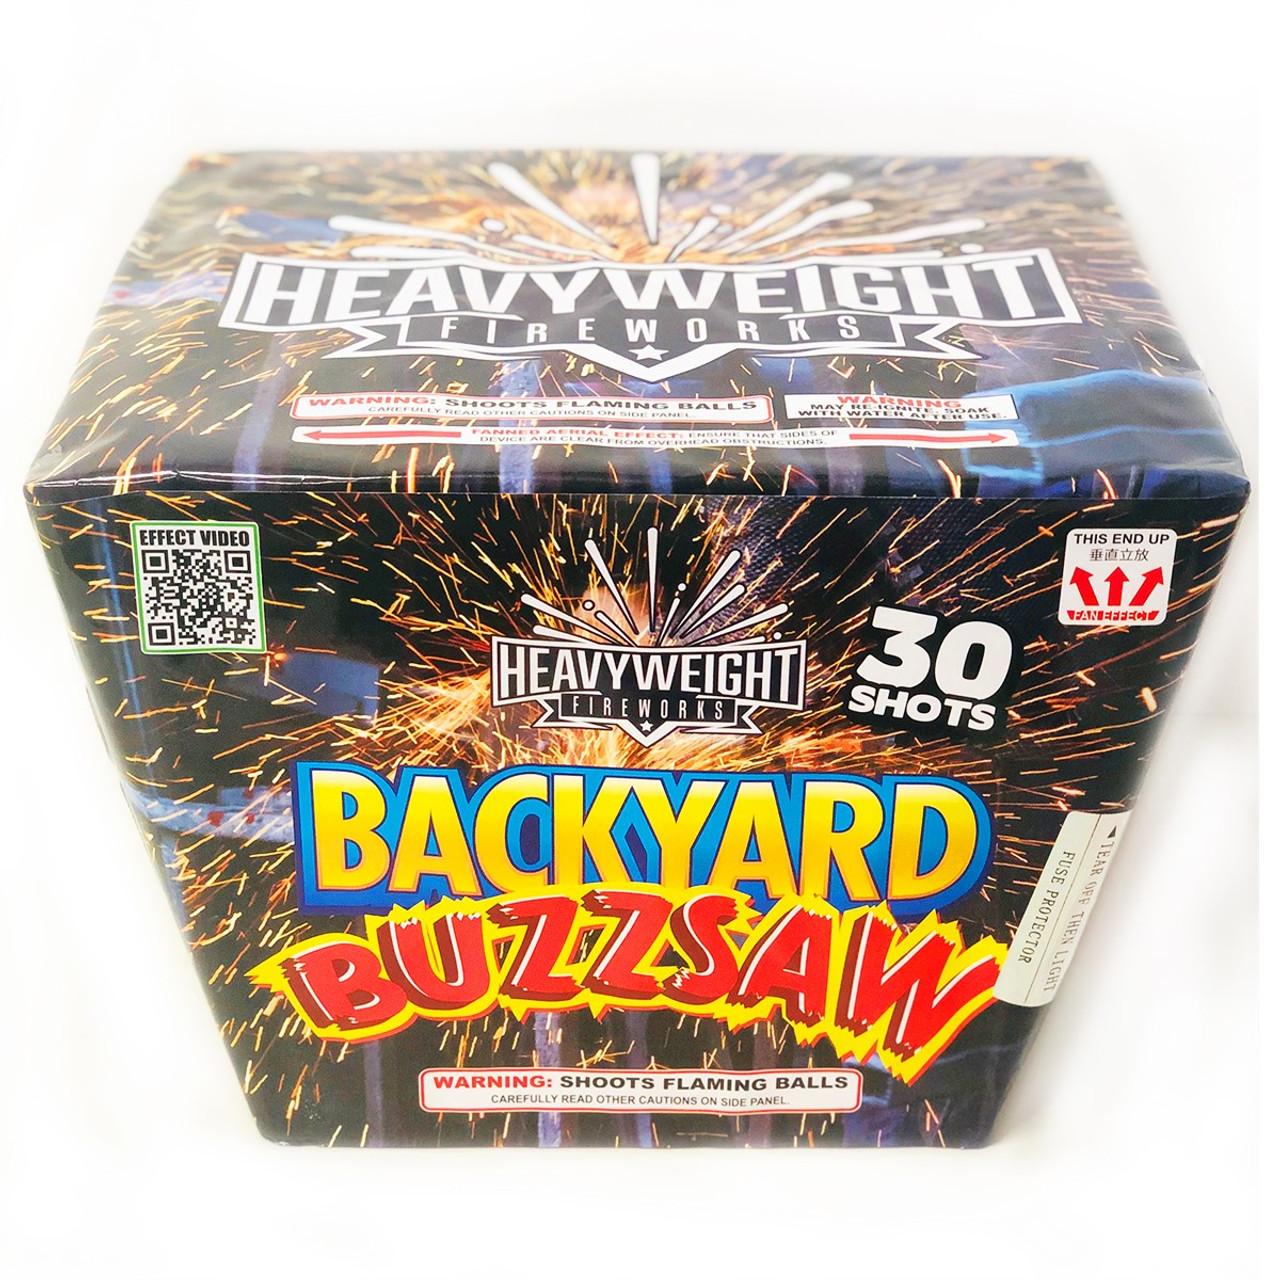 Heavyweight Fireworks